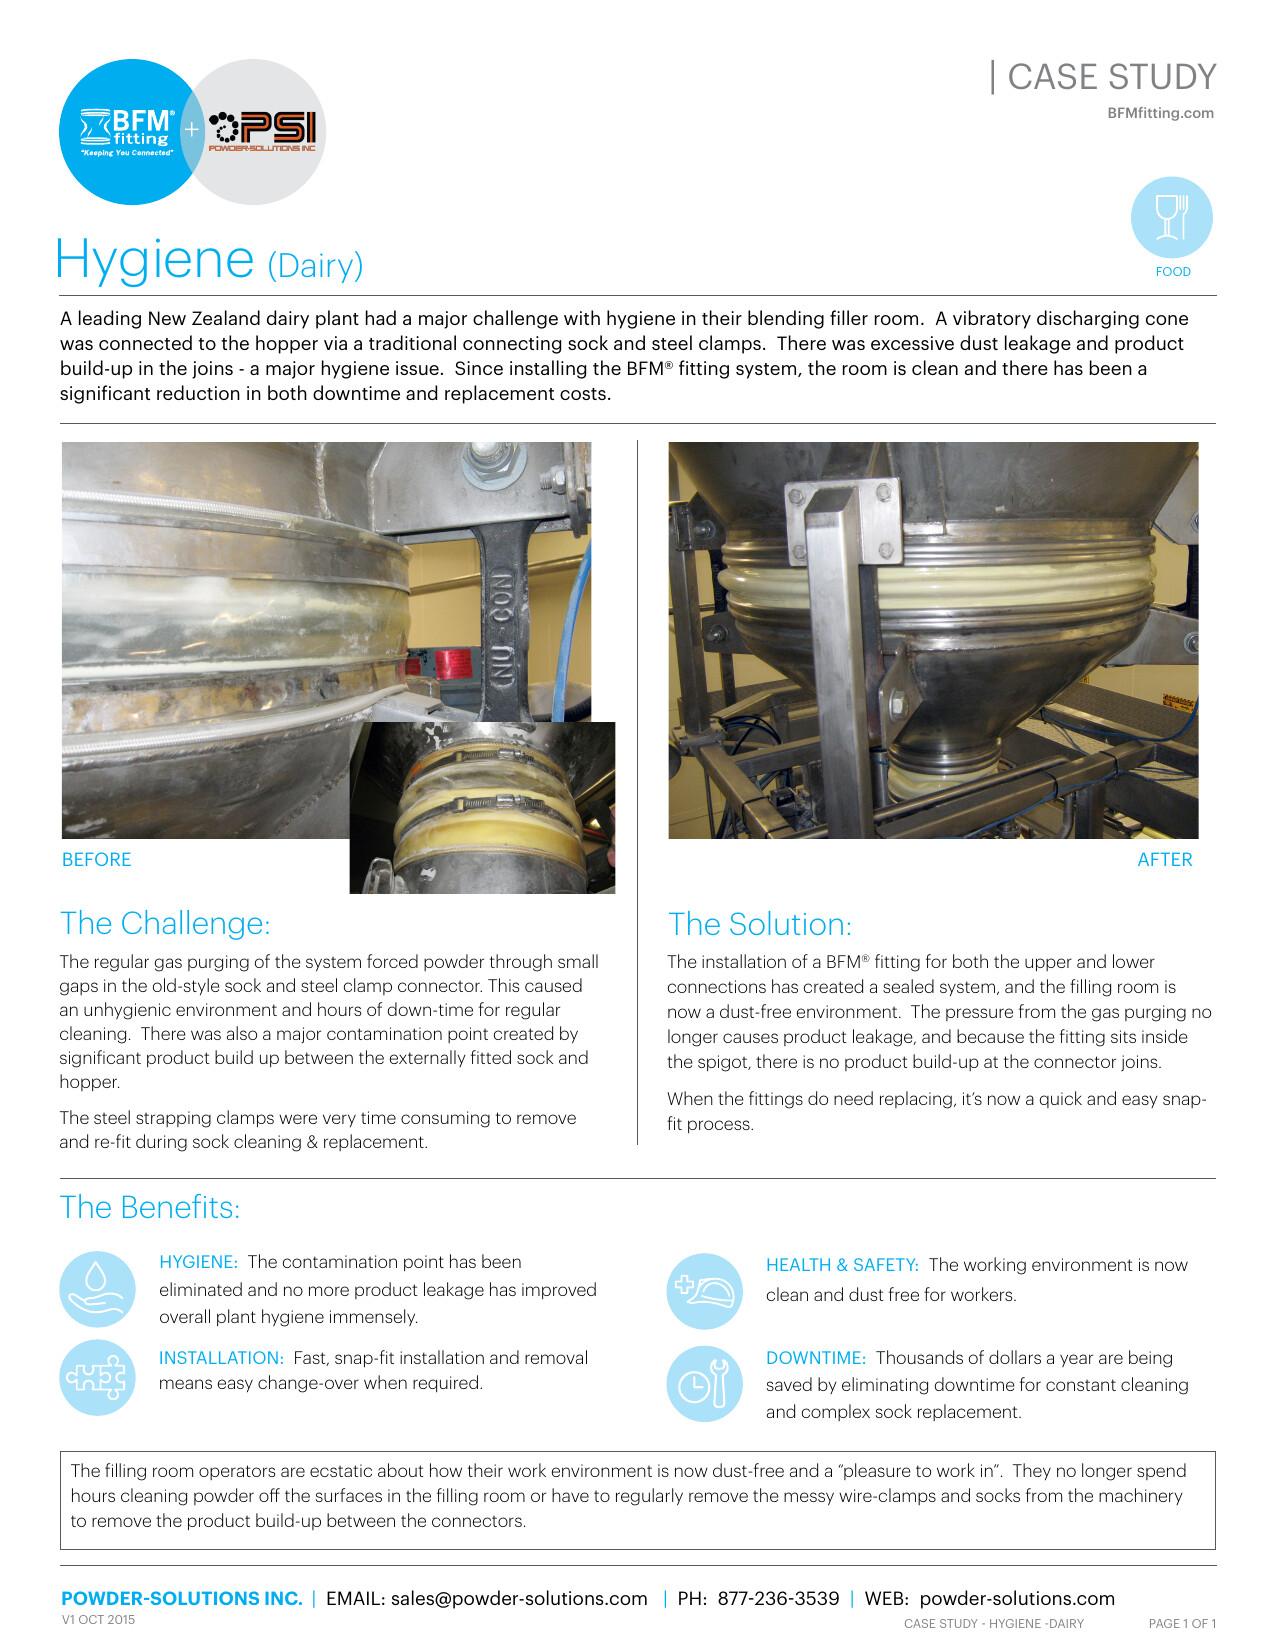 PSI BFM Case Study Hygiene (Dairy) V1 Oct 2015 DAIRY